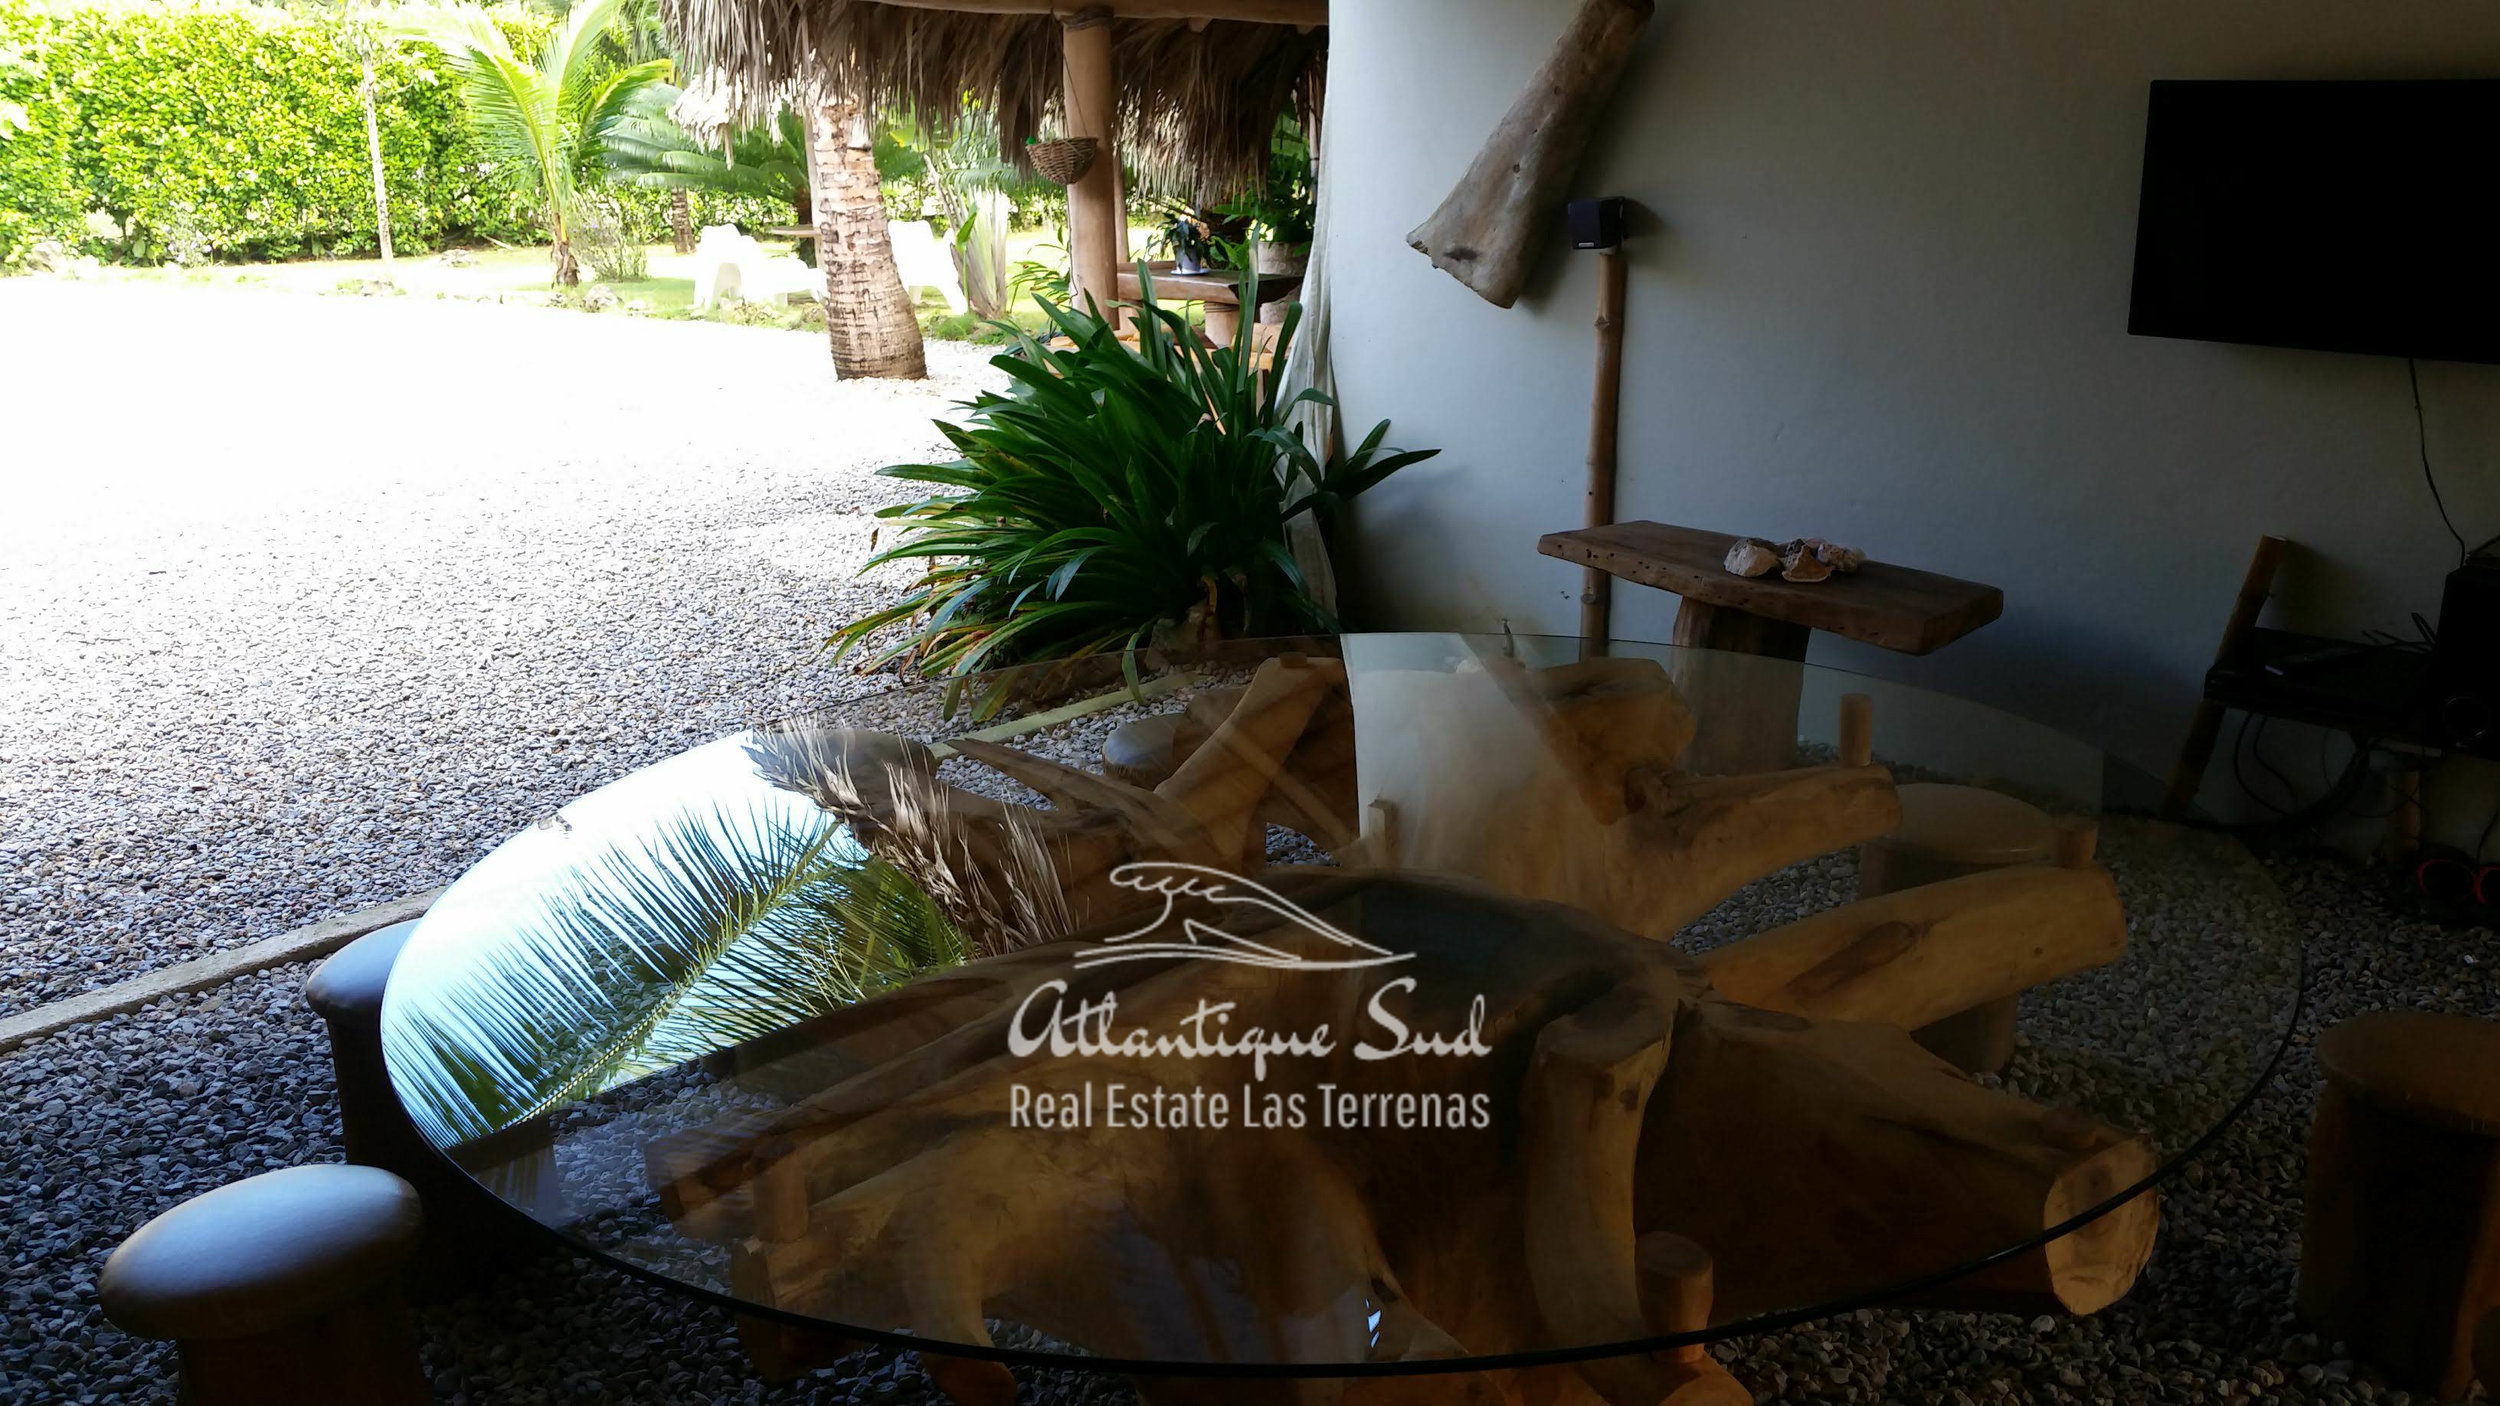 Typical caribbean hotel for sale Real Estate Las Terrenas Dominican Republic Atlantique Sud22.jpeg